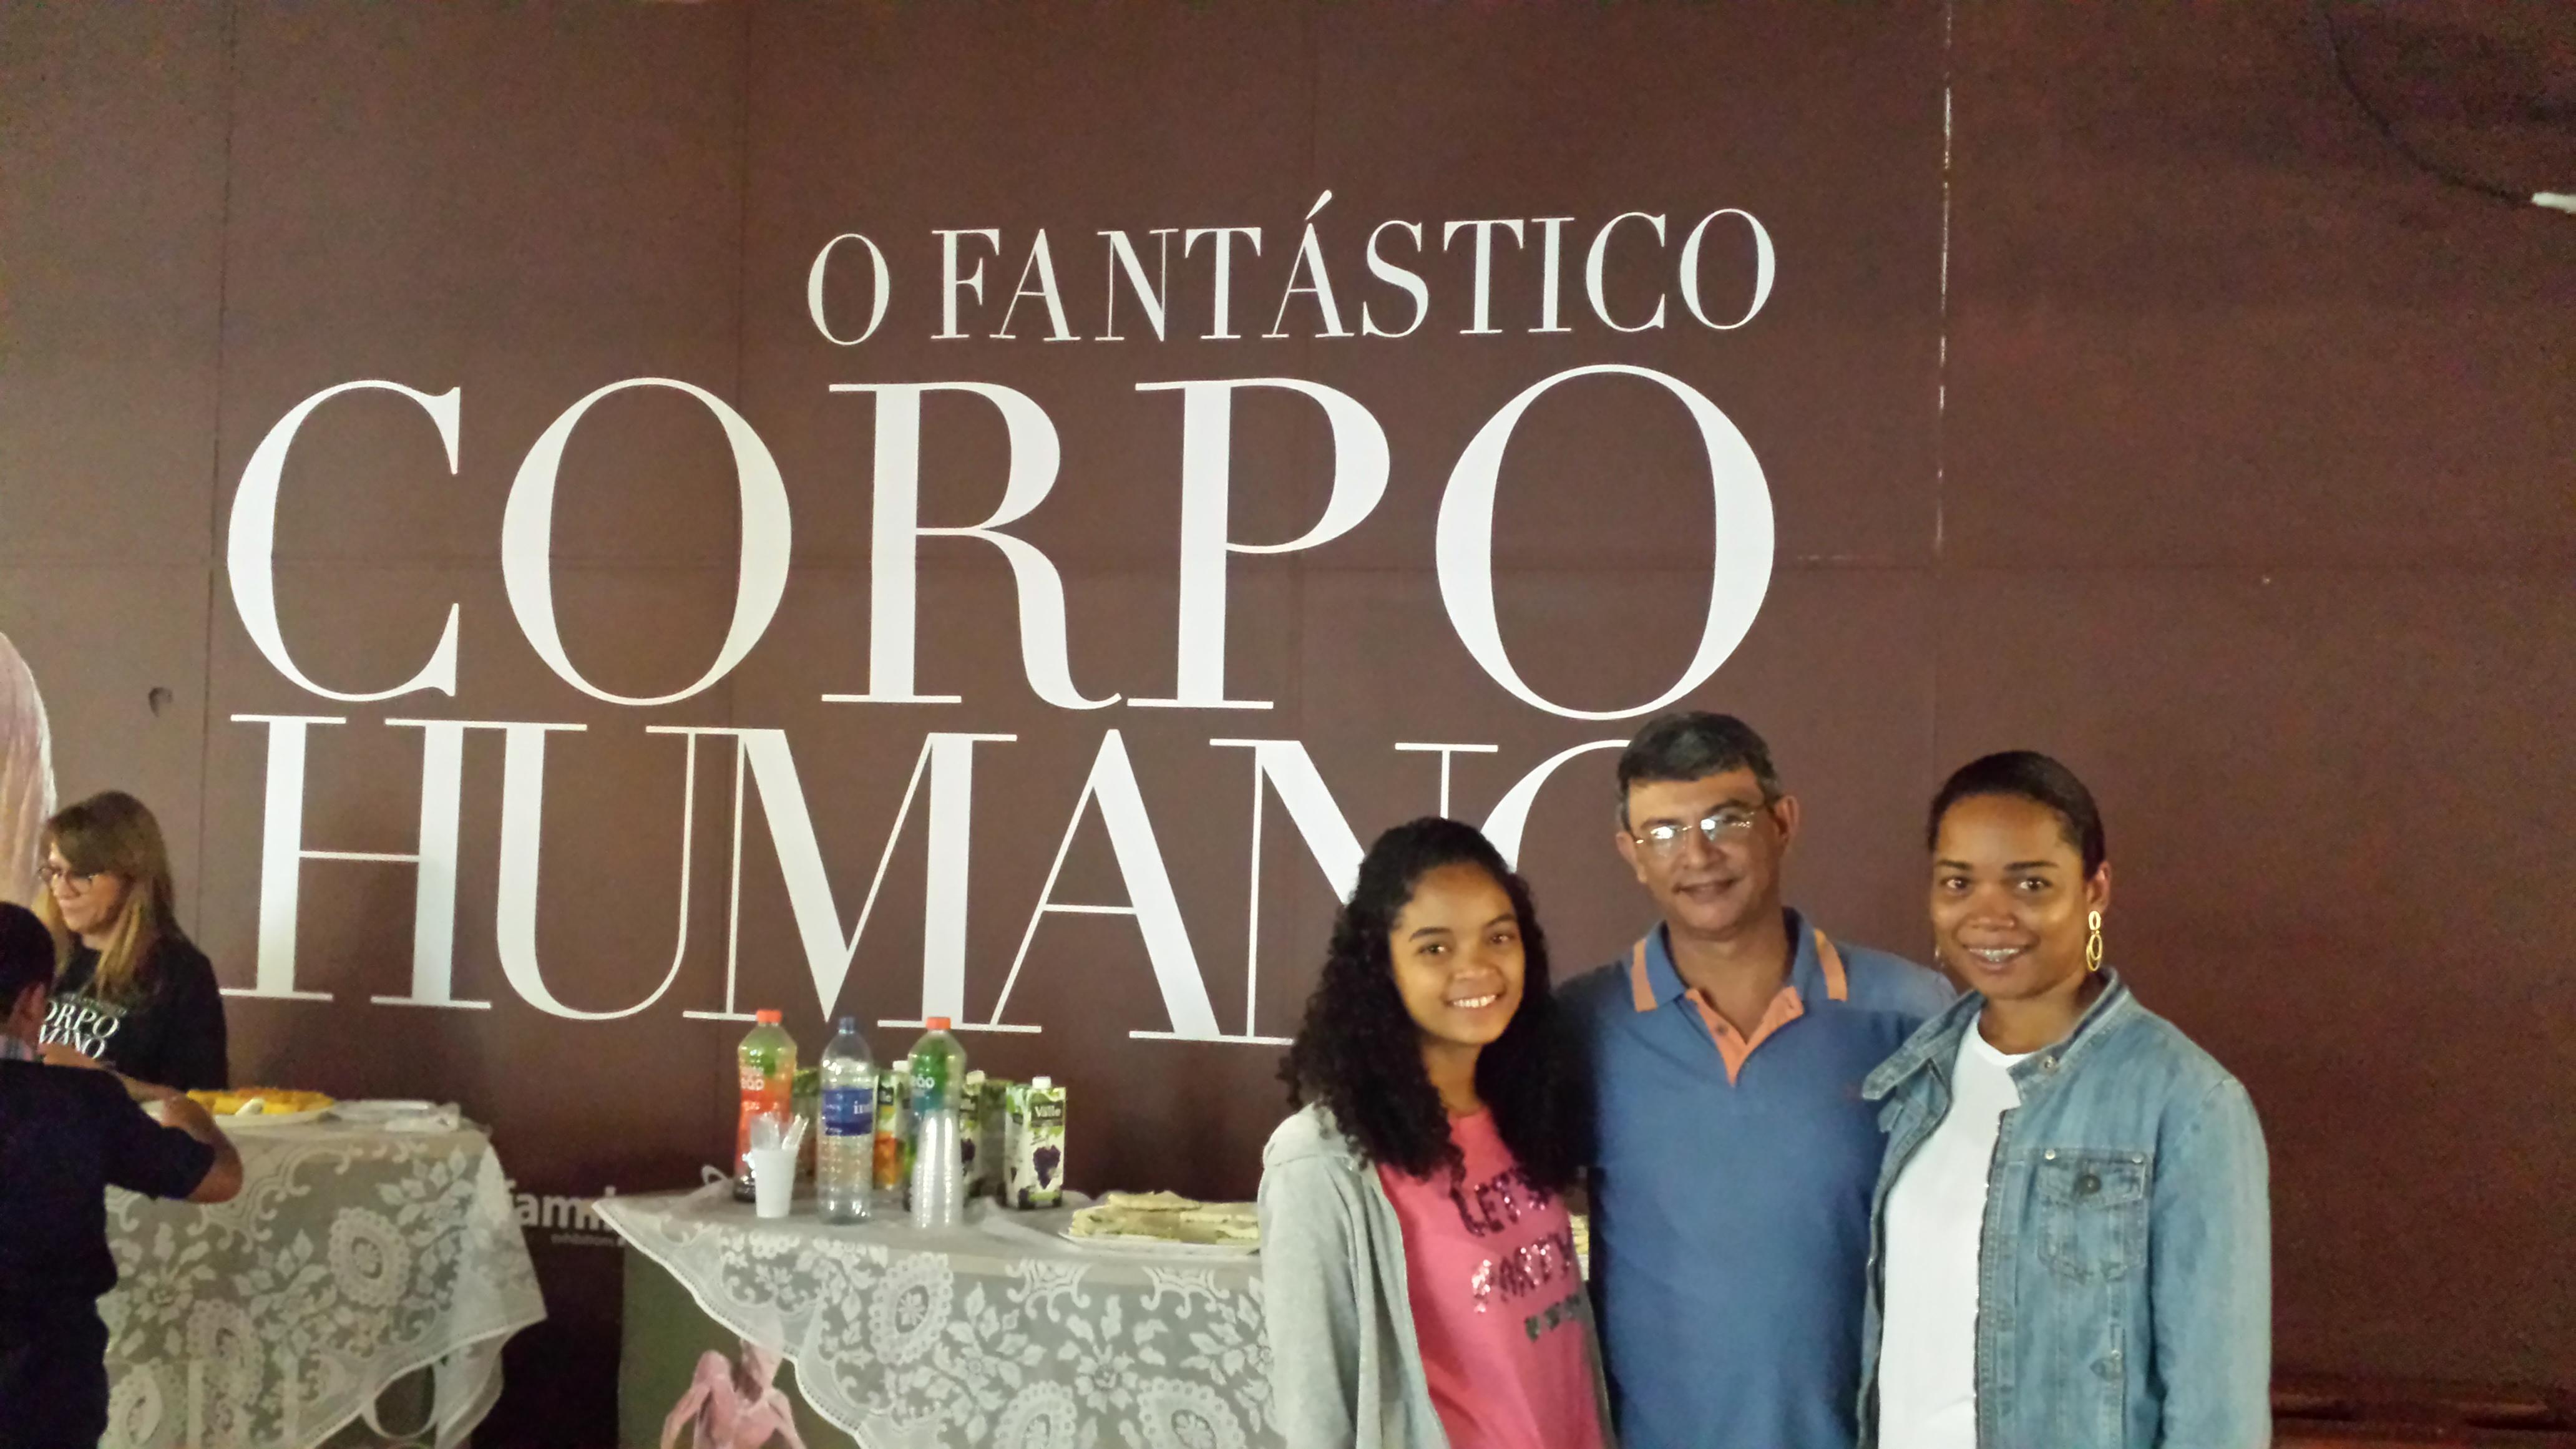 Luis Gustavo de Castro Carvalho, Beatriz Silva e Marisa Rosa